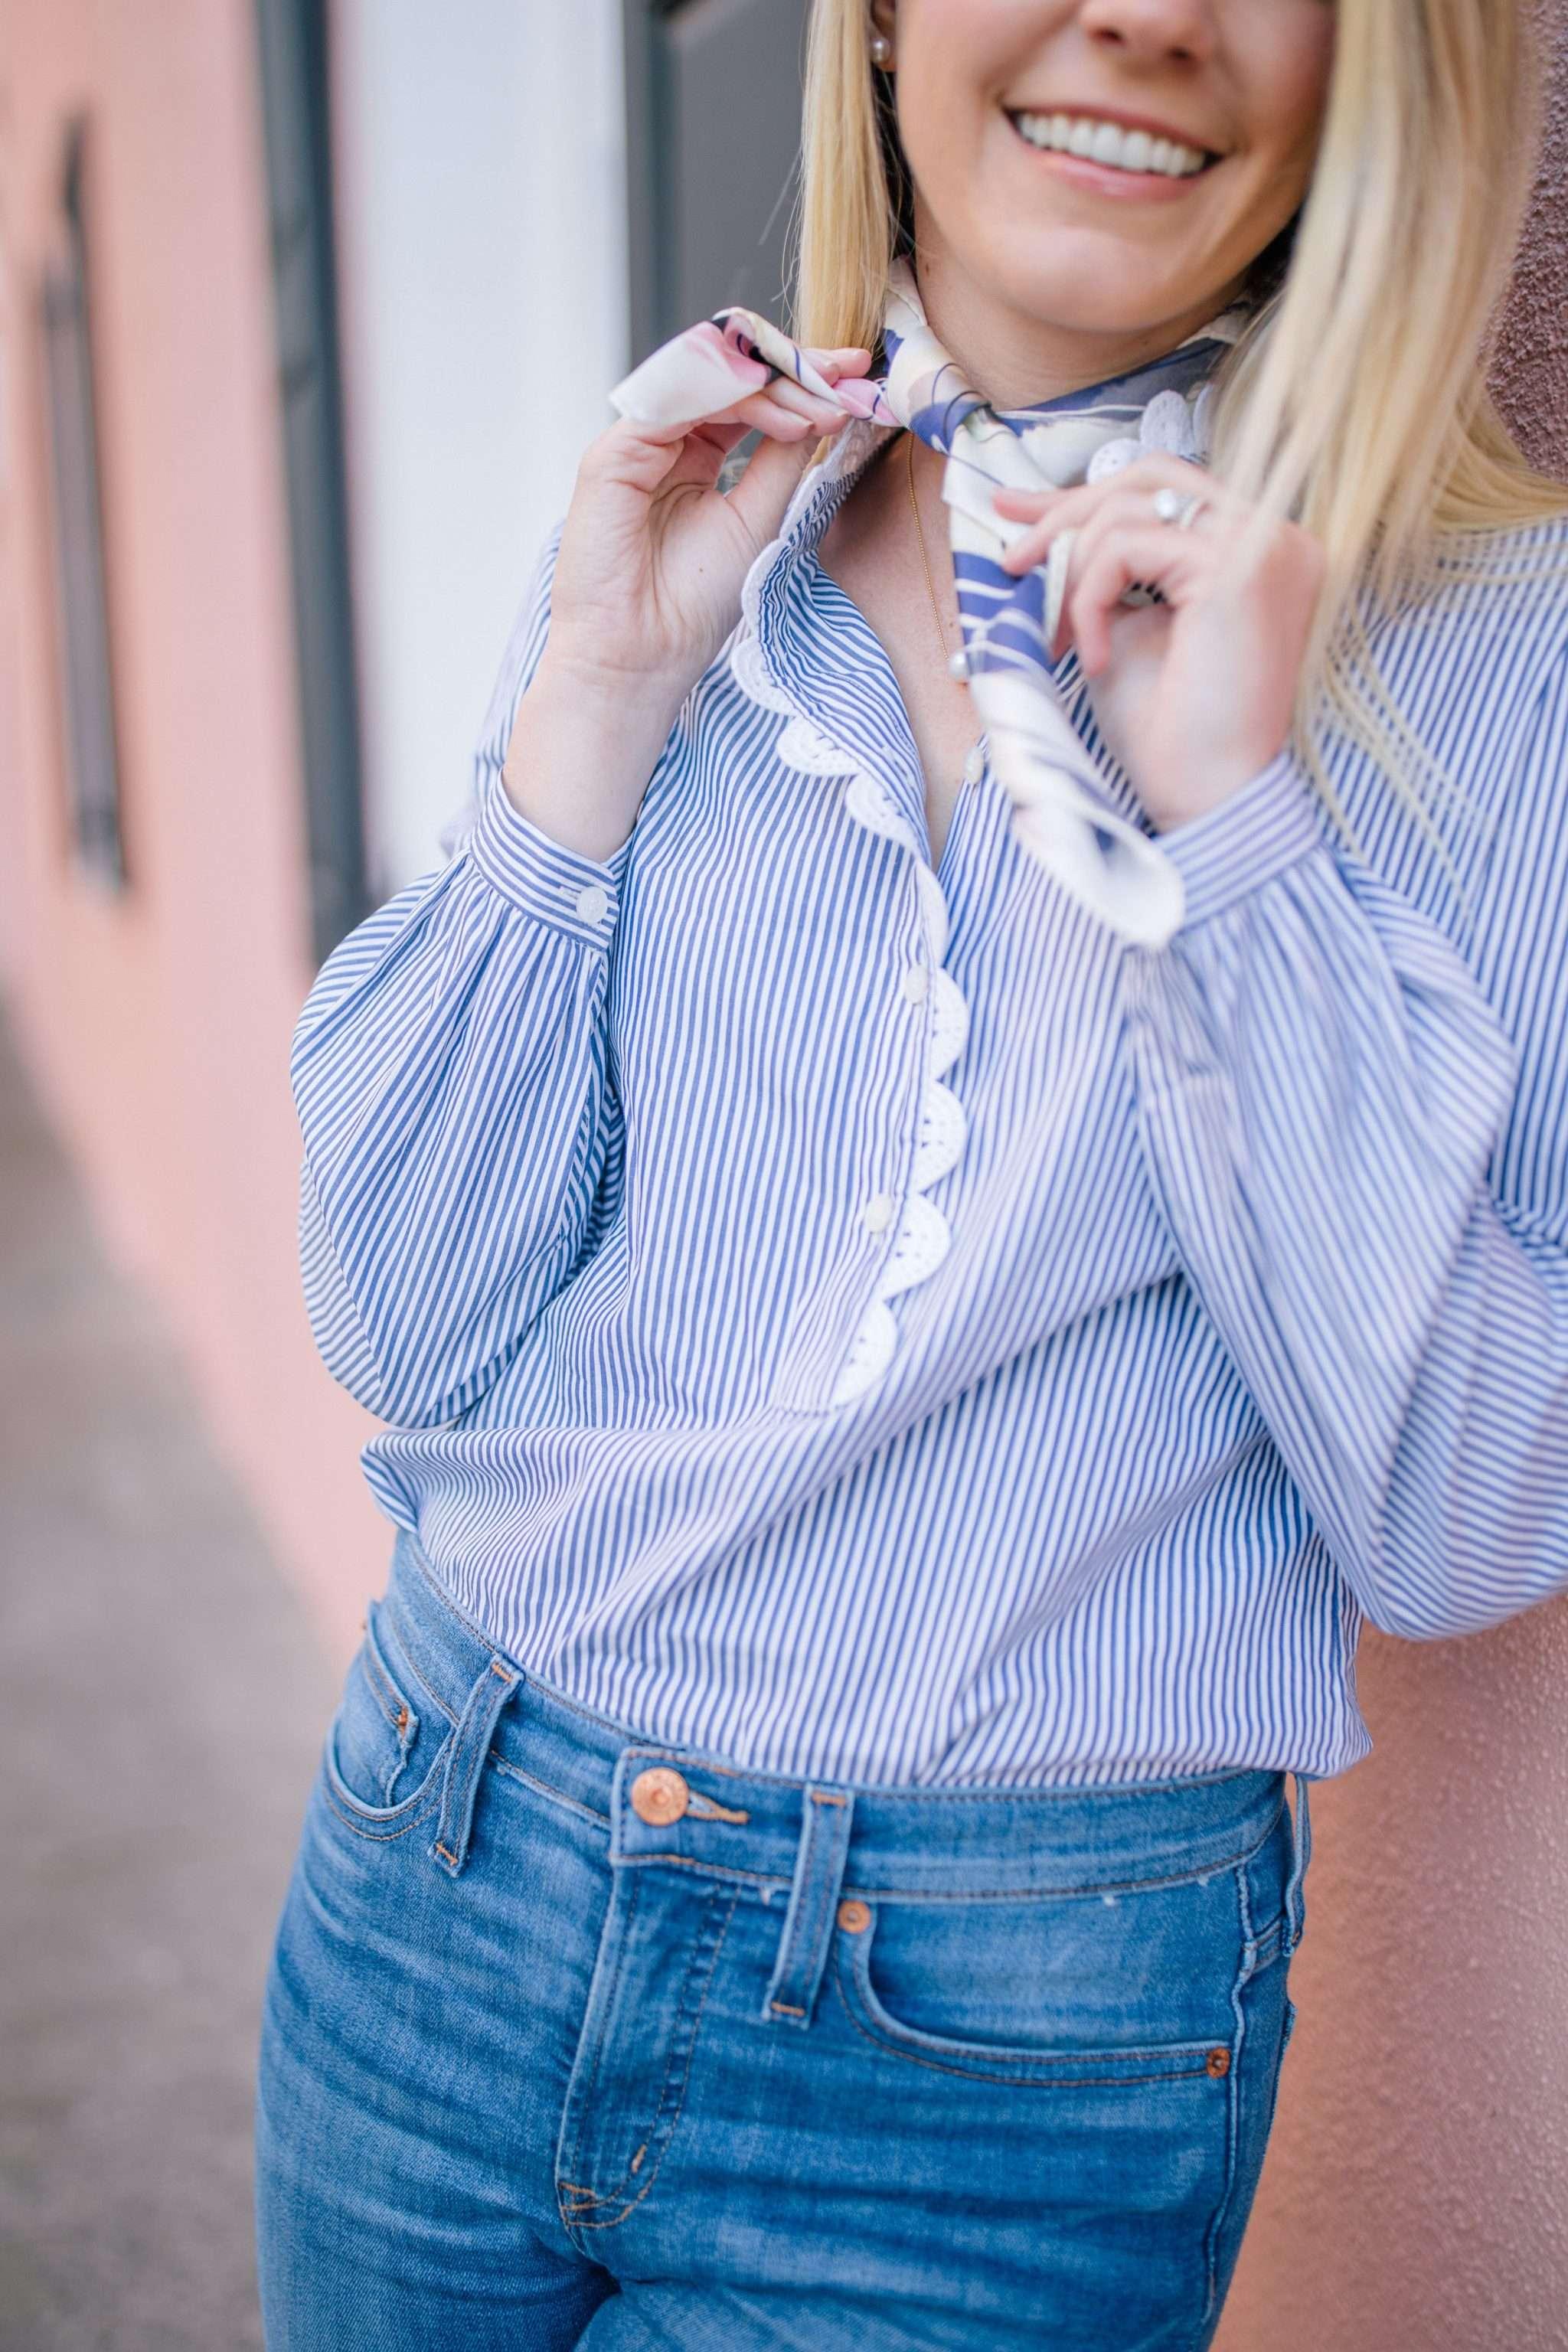 Chic ways to wear a scarf + my favorite neck scarfs   Rhyme & Reason